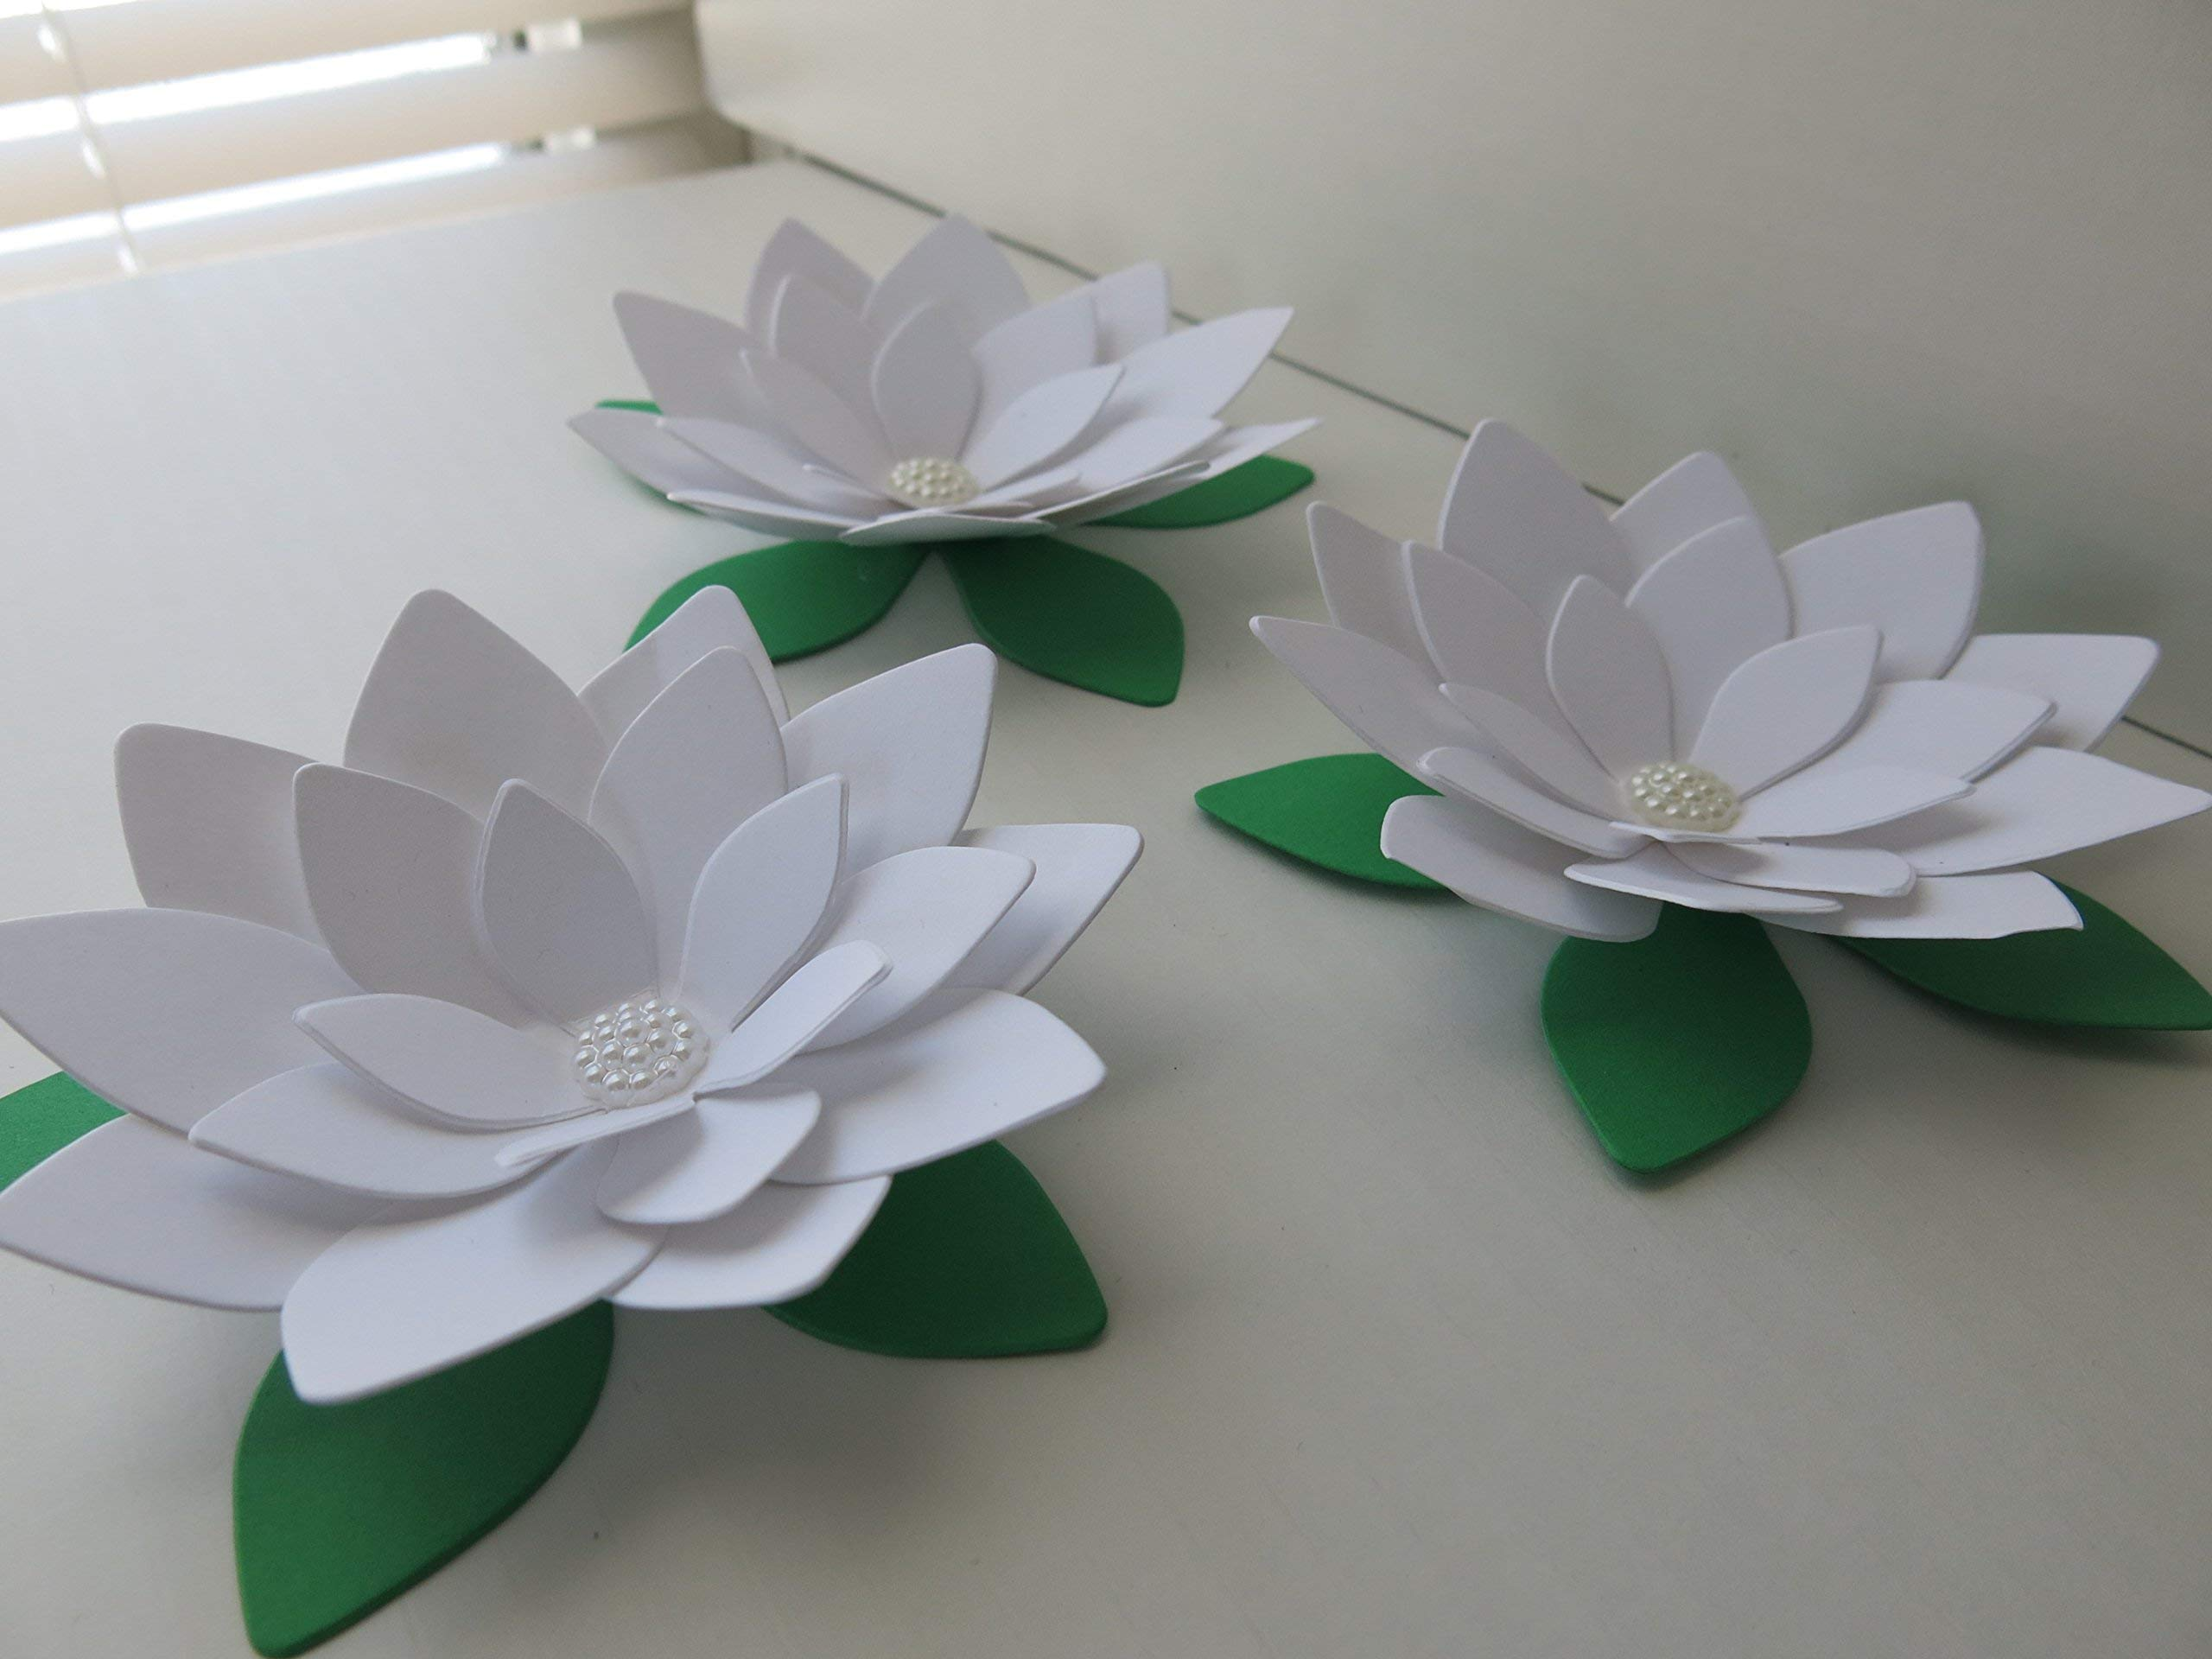 silk flower arrangements white lotus paper flowers 4 inch water lily set of 3 blooms 3d wedding table runner centerpiece decor